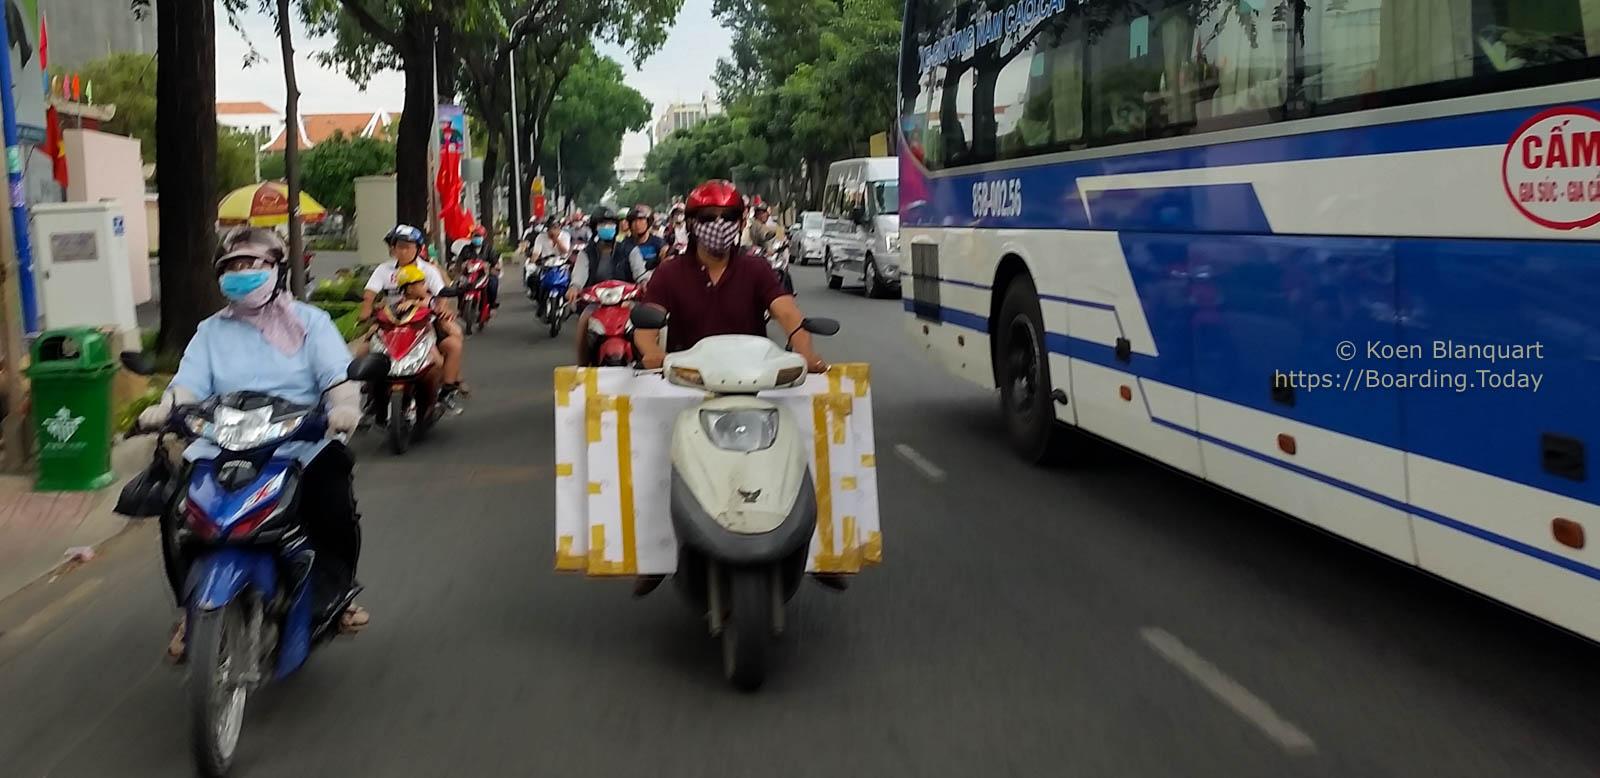 20170125-2017-01-25 15.05.08Ho Chi Minh City, Saigon, Vietnam by Koen Blanquart for Boarding.Today.jpg